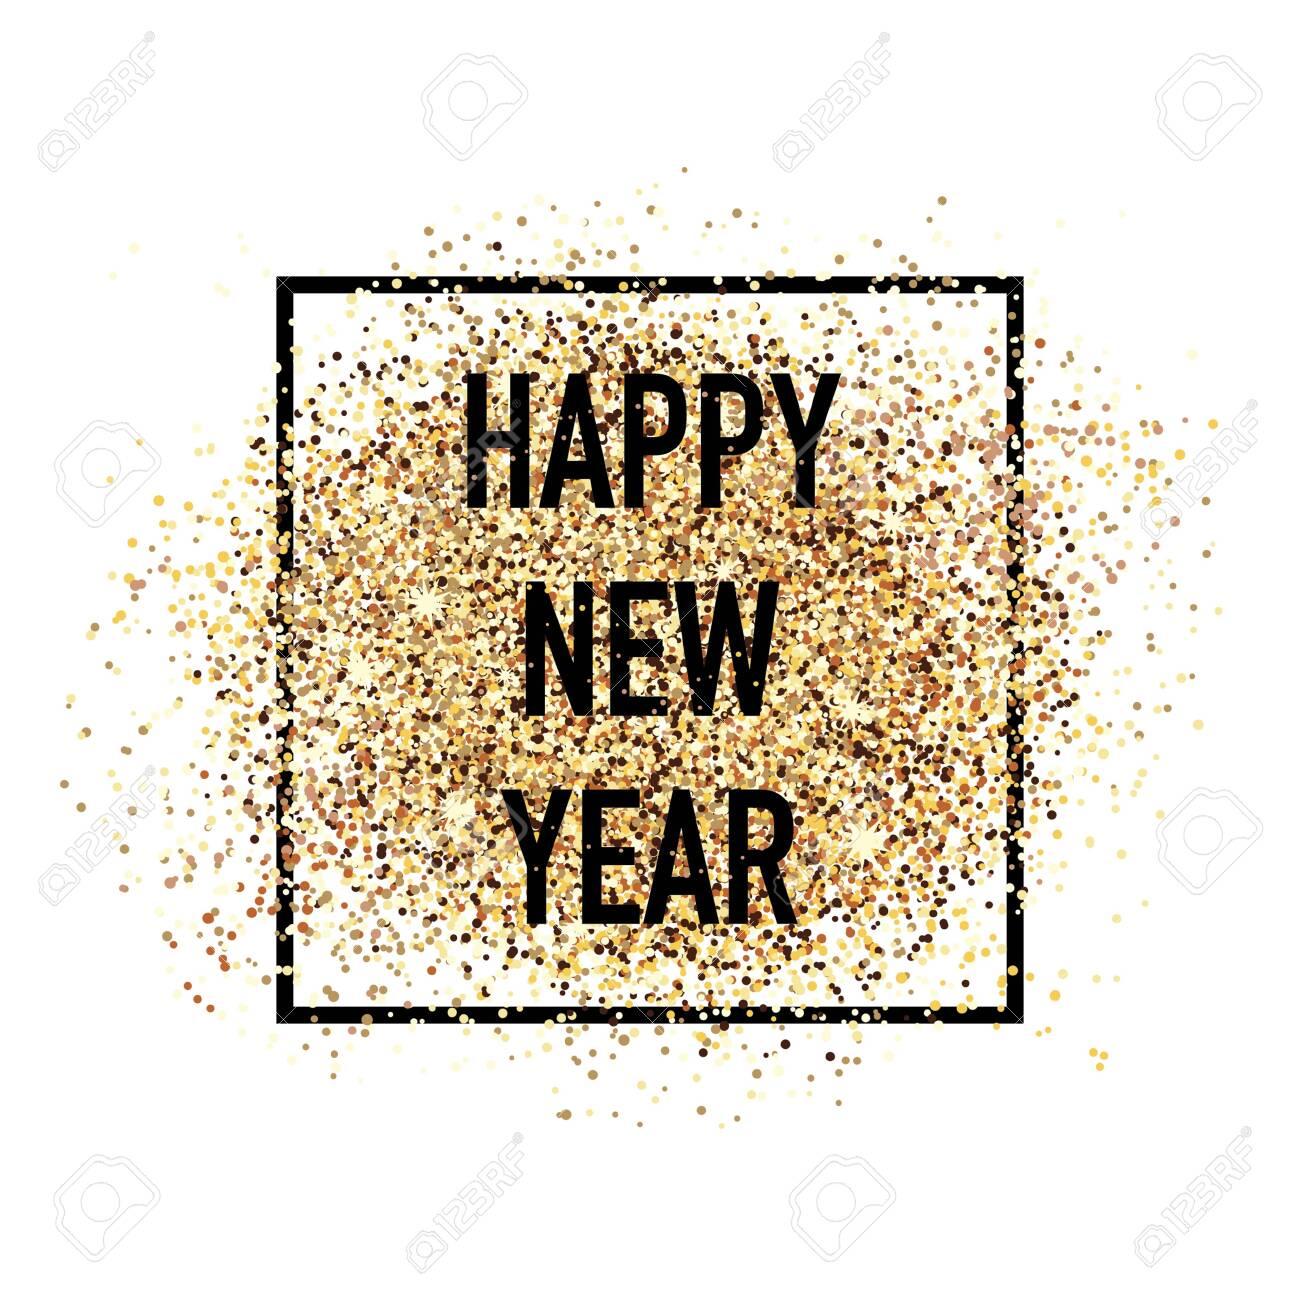 Happy new year confetti postcard decoration. For print and web winter seasonal greetings. Retro style beautiful holidays celebration card. - 130659930